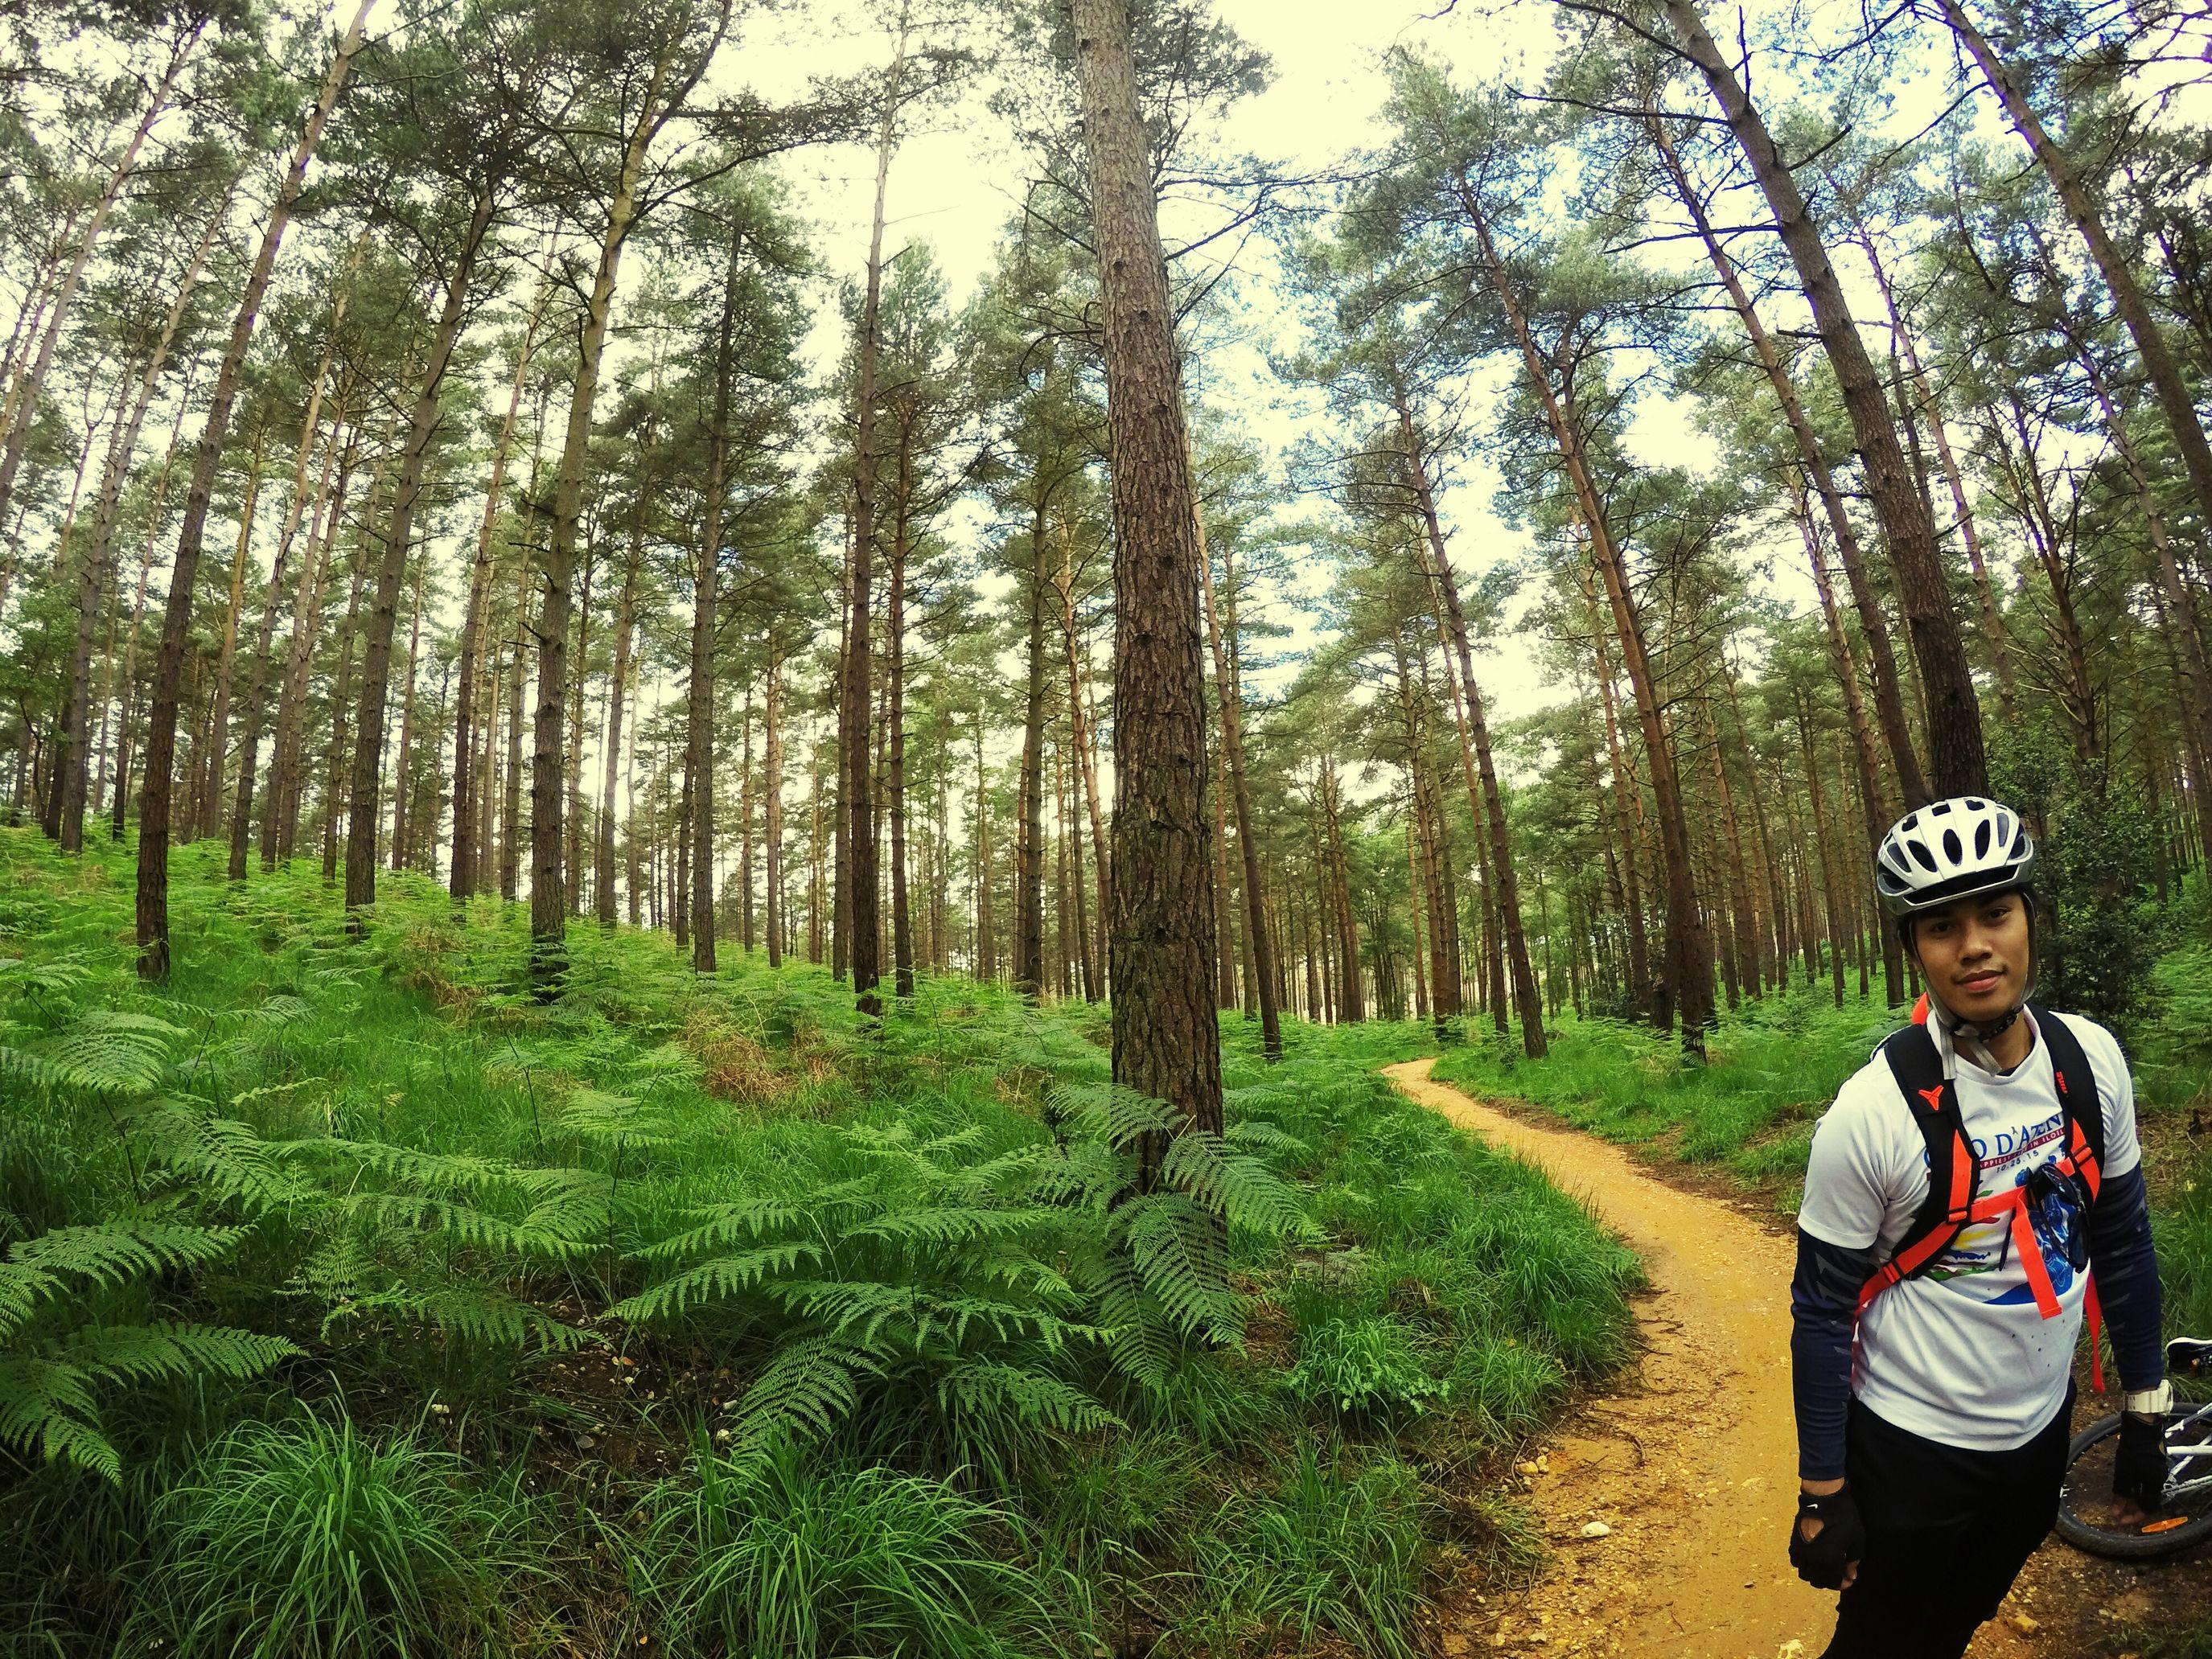 rider. 🚴💙 Bike Bike Ride Bike Love Nature United Kingdom Swinley Feel The Journey